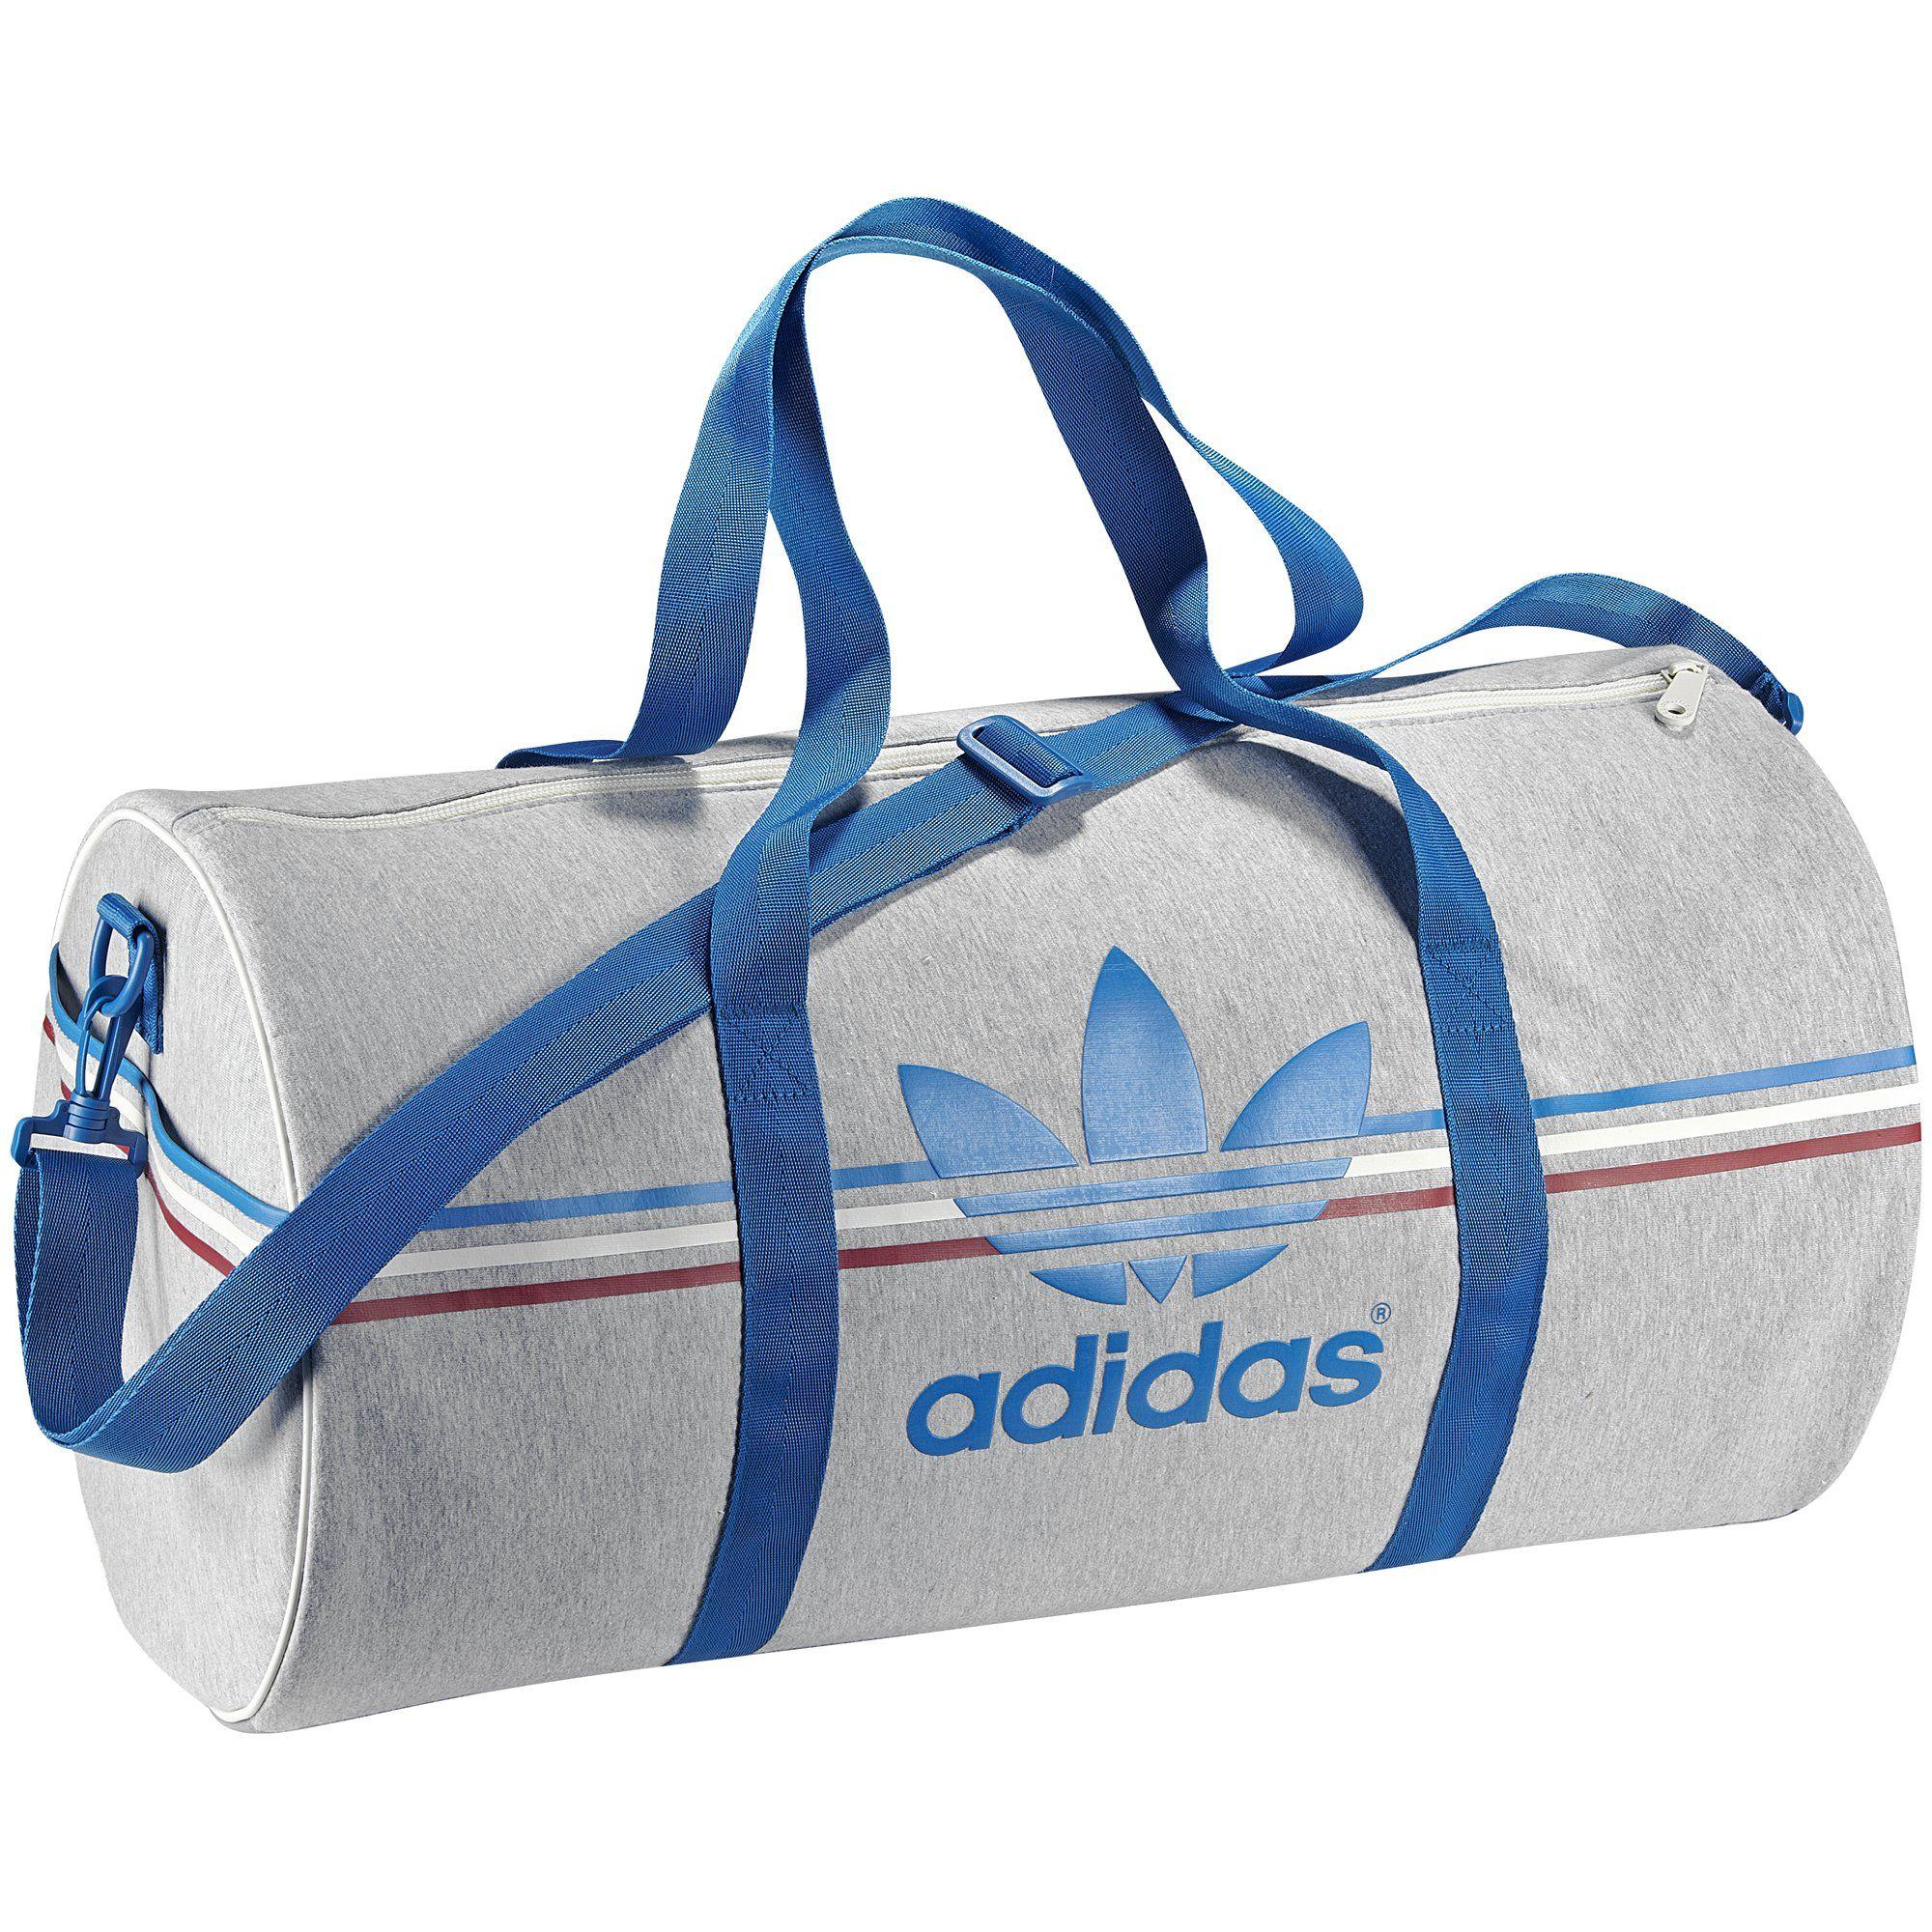 Jersey Duffel Max, Medium Grey Heather   Style   Pinterest   Bags ... 8bc5ee31d8